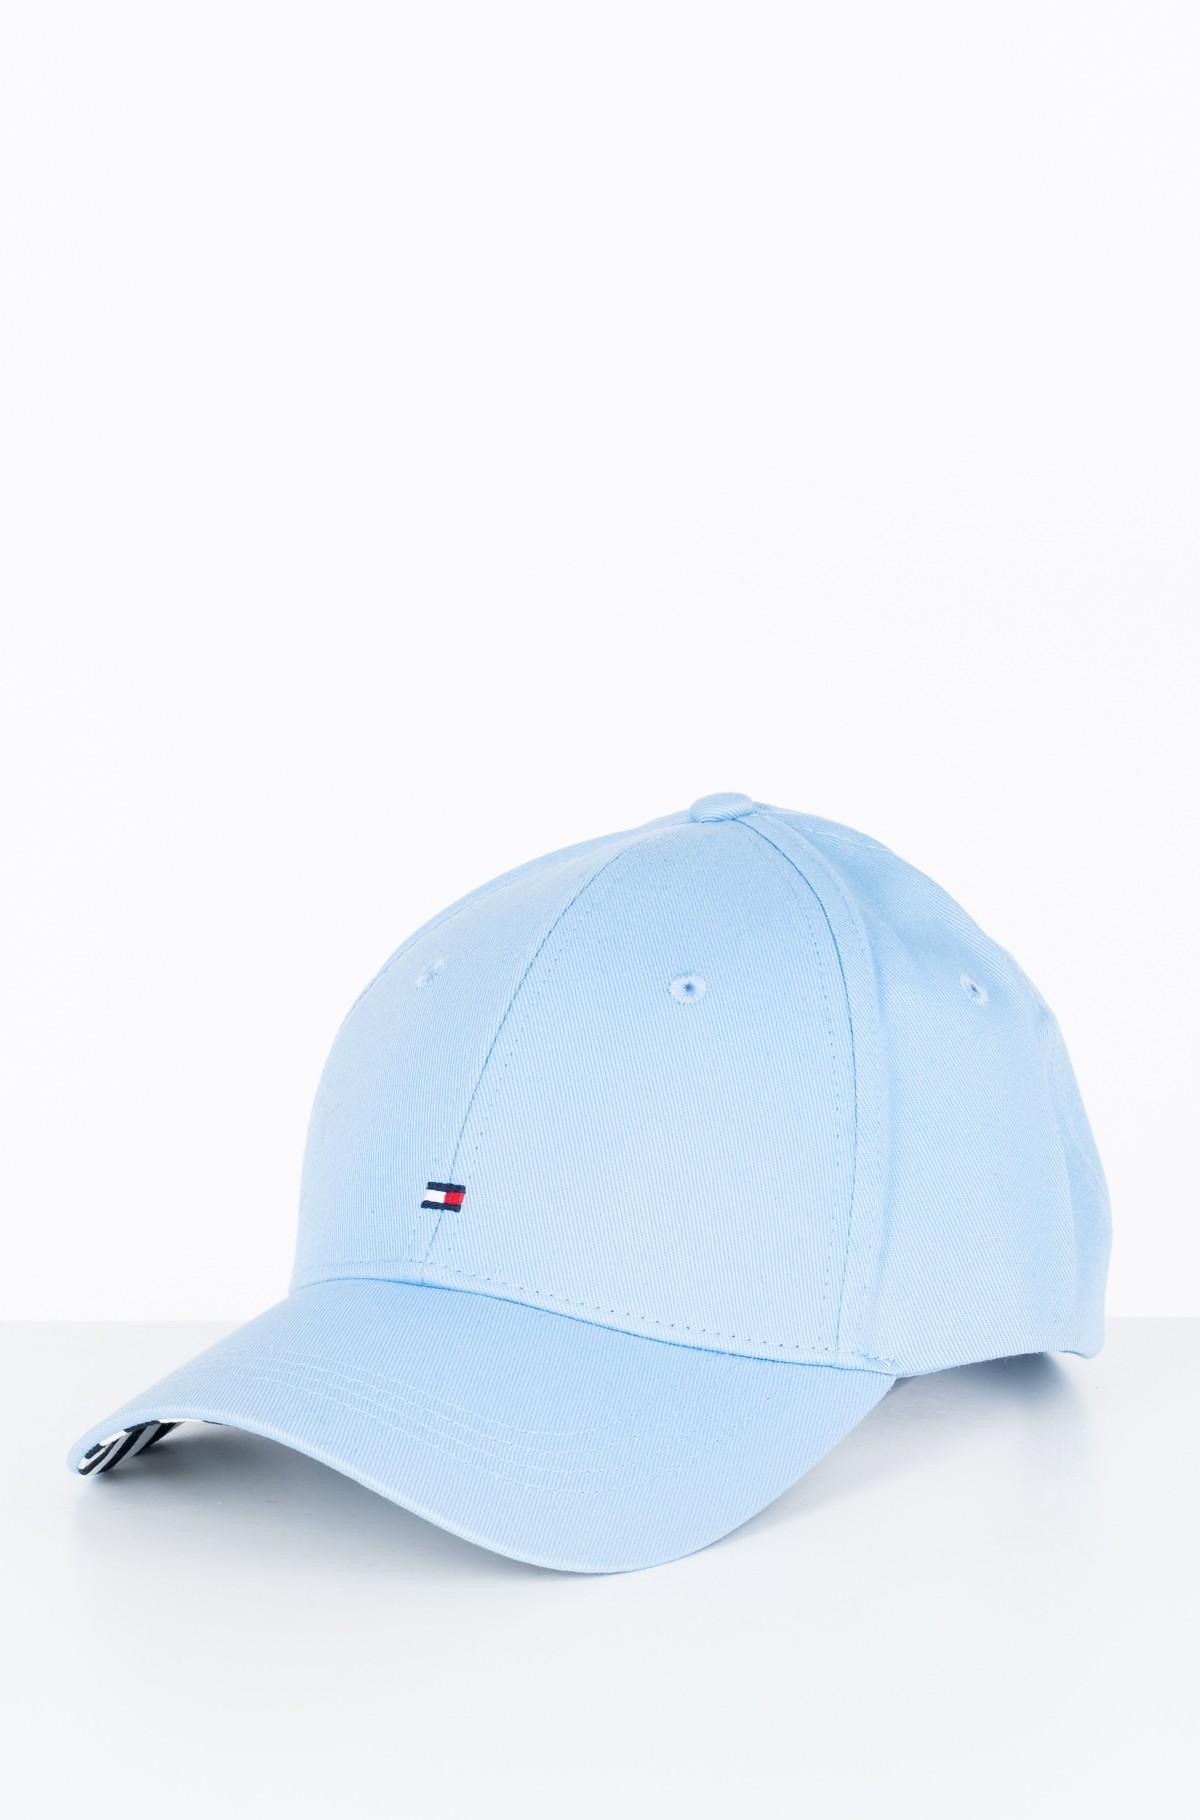 Nokamüts BB PRINT CAPBB PRINT CAP-full-1